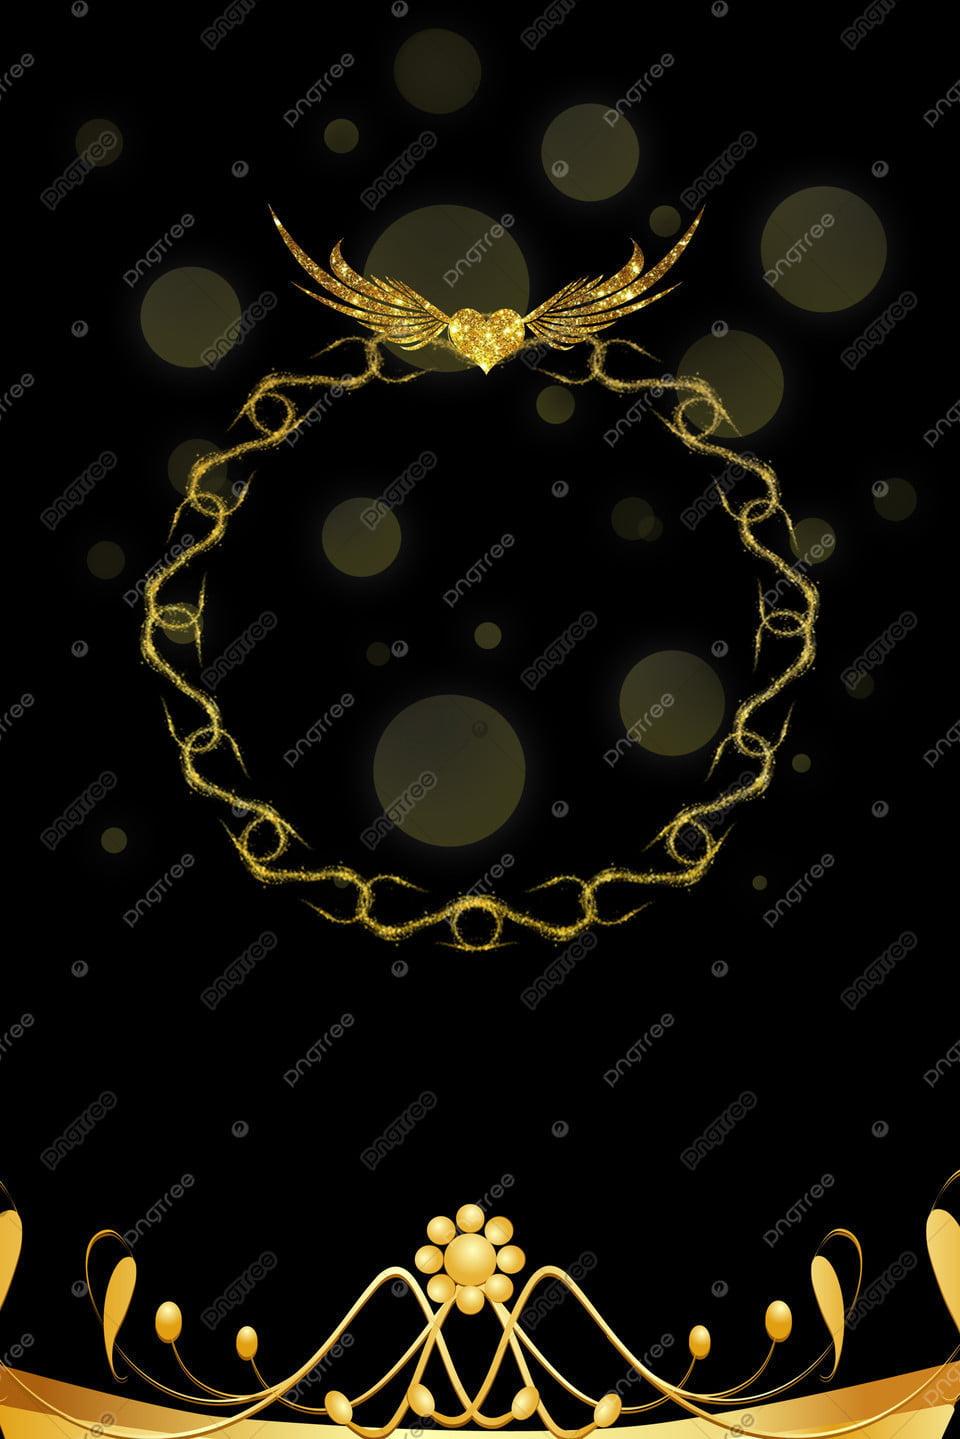 Background Bahan Latar Belakang Poster Promosi Produk Topeng Emas Topeng Emas Pemutih Kulit Kecantikan Medis Gambar Latar Belakang Untuk Unduhan Gratis